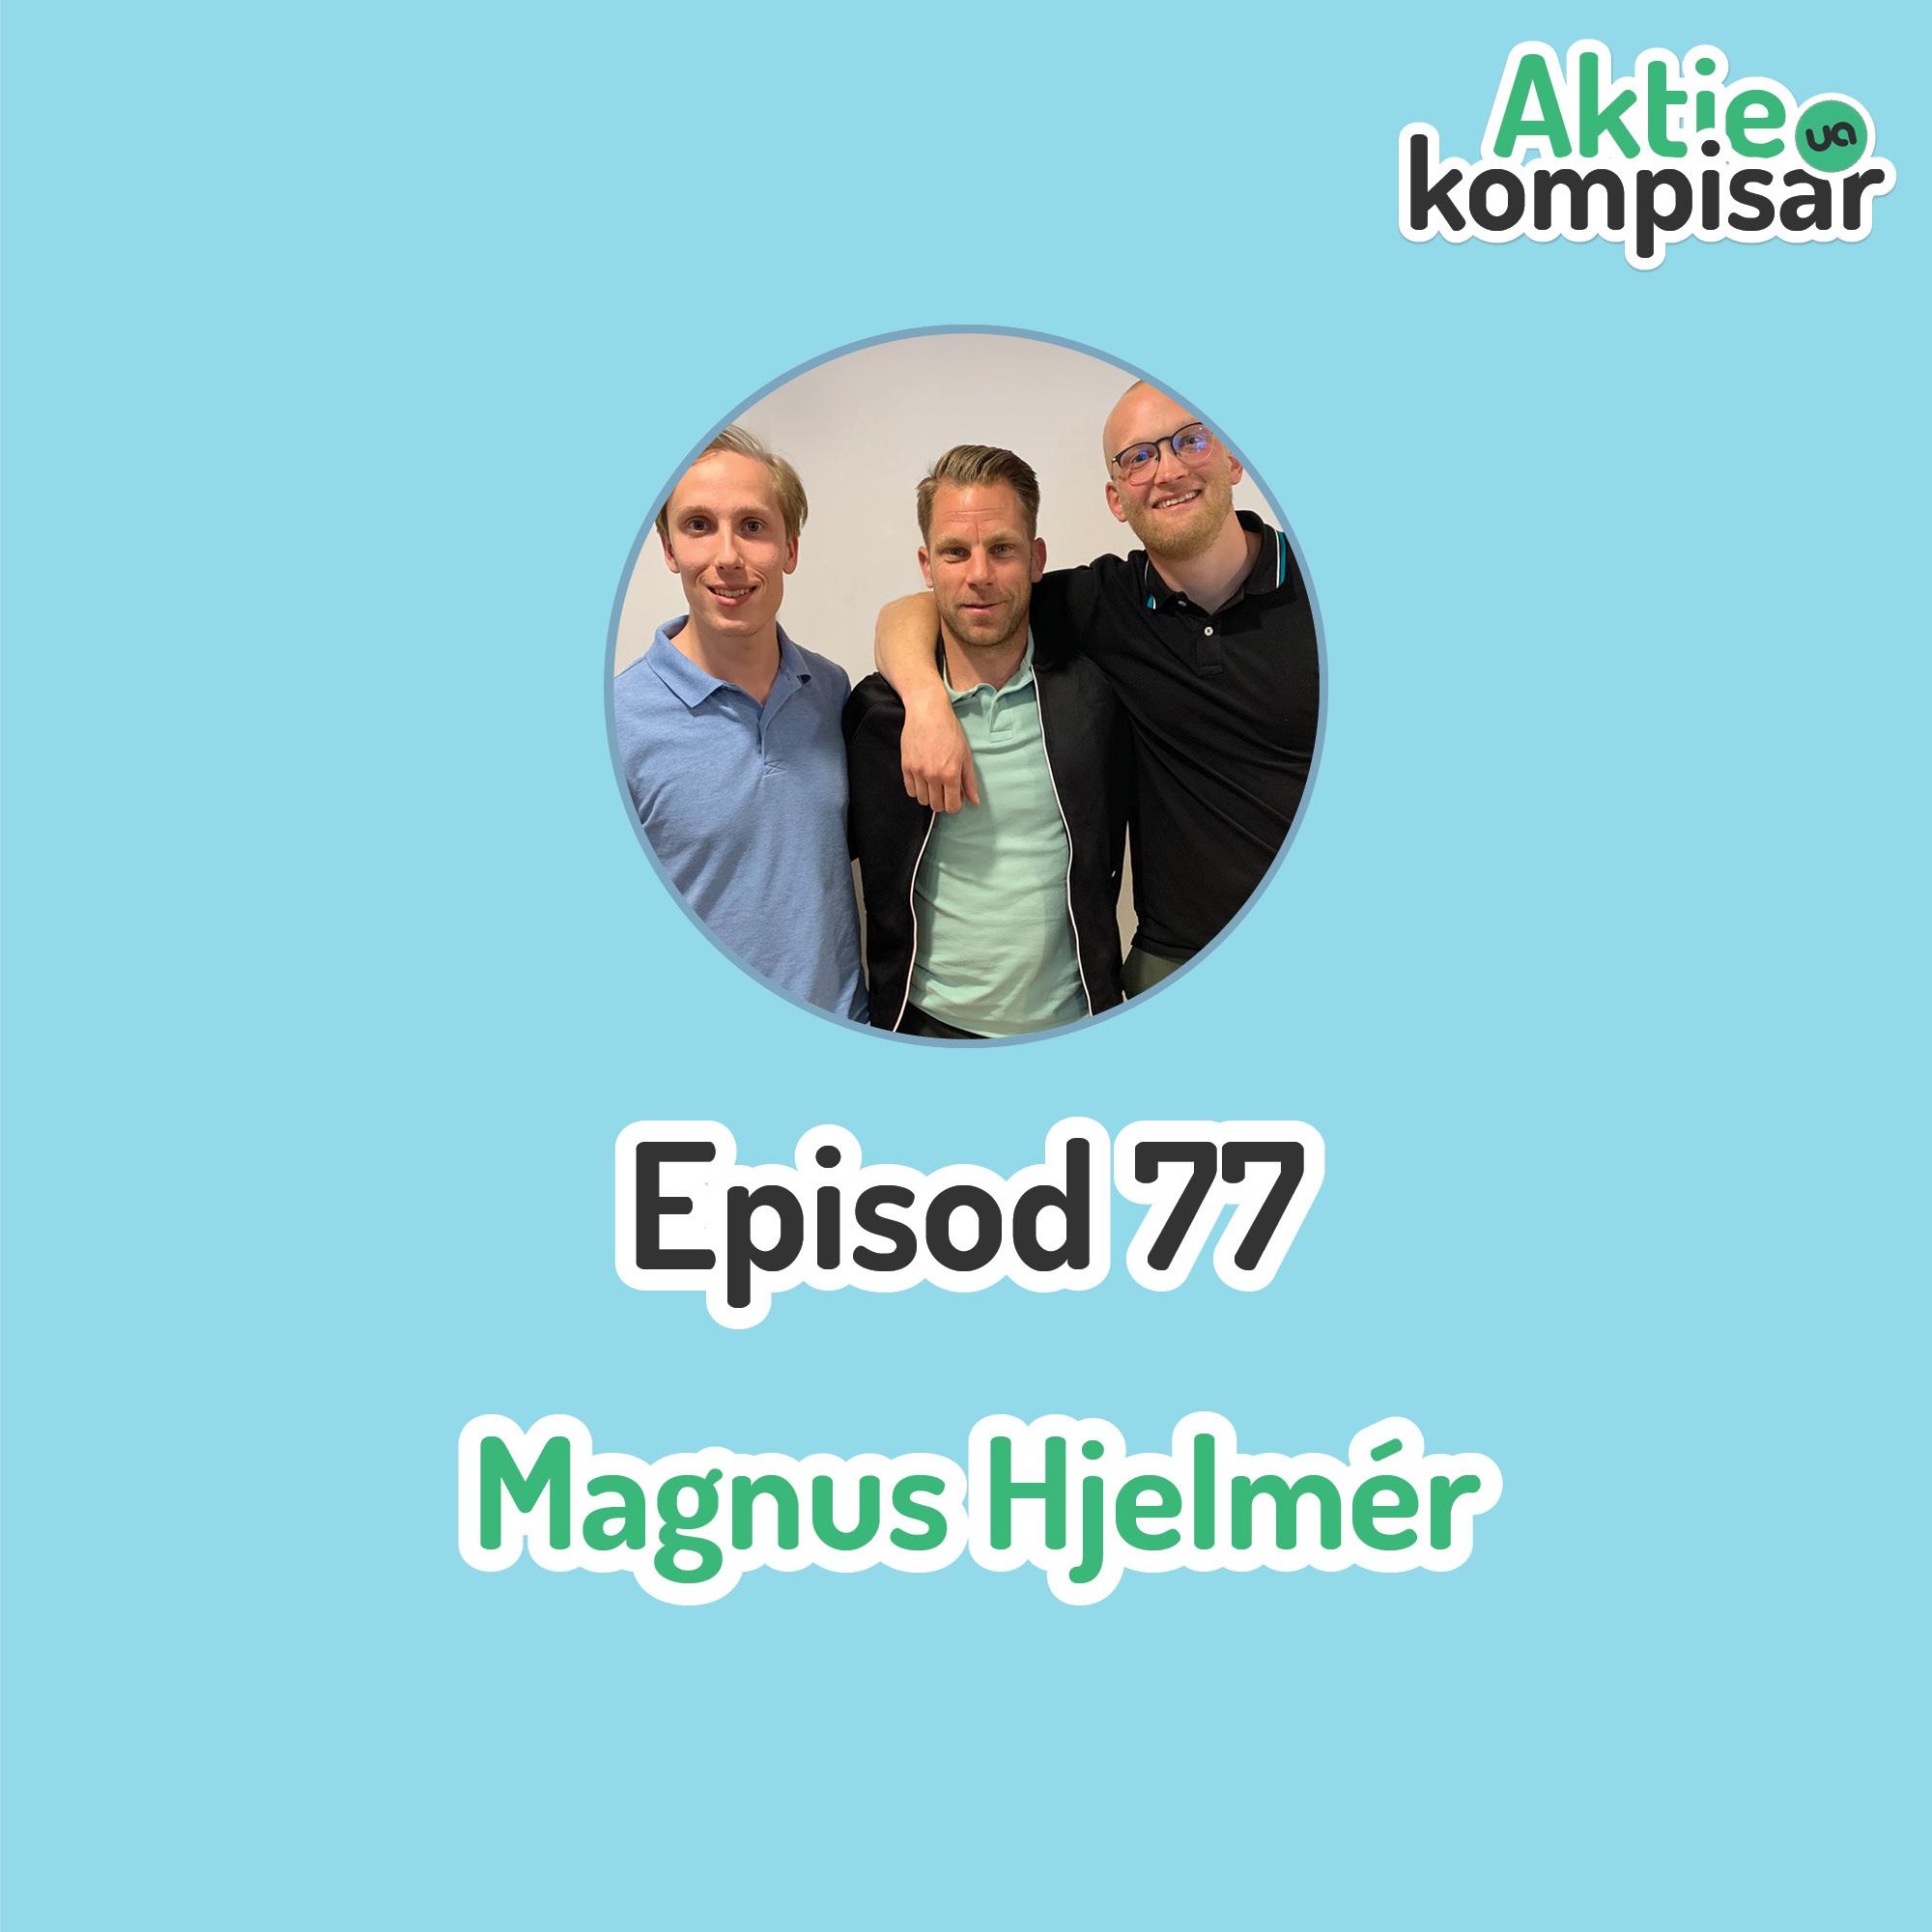 Episod 77 - Vardagsekonomi med Magnus Hjelmér